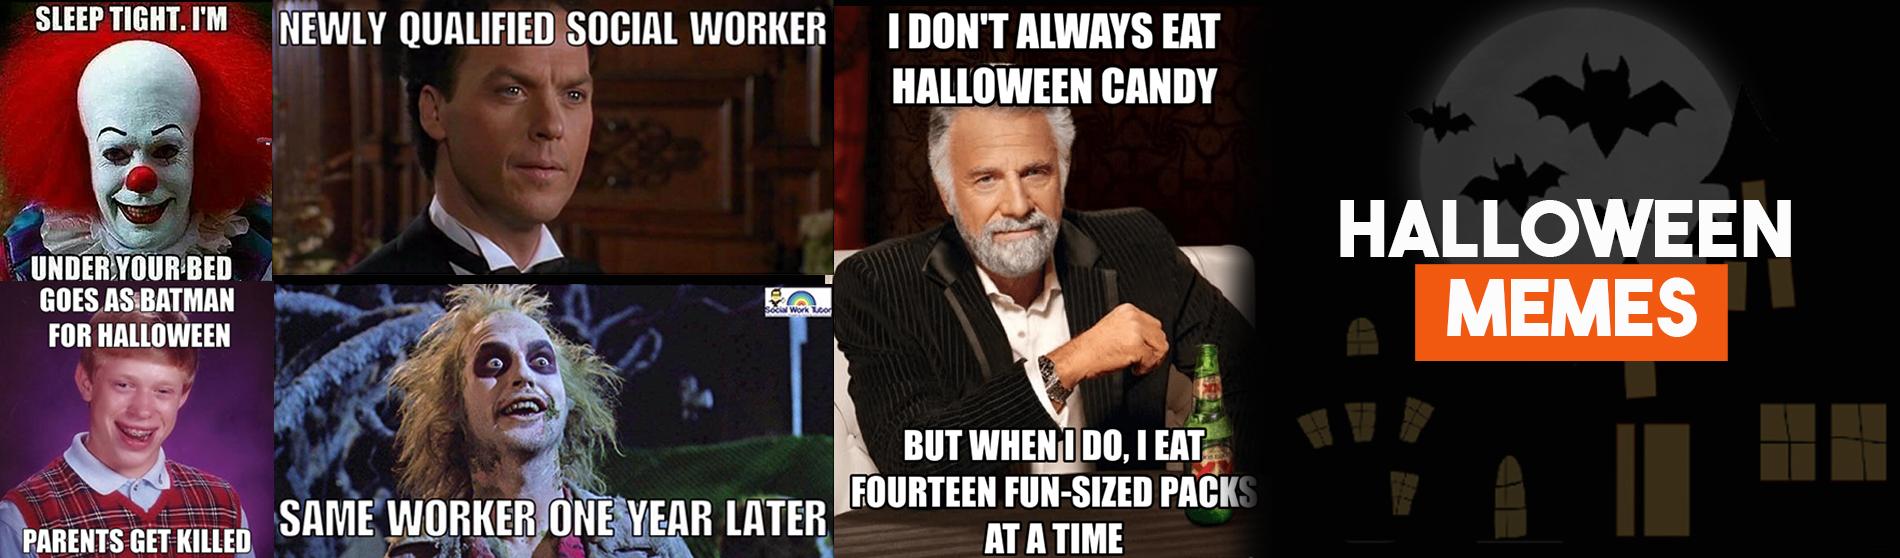 Halloween-Memes